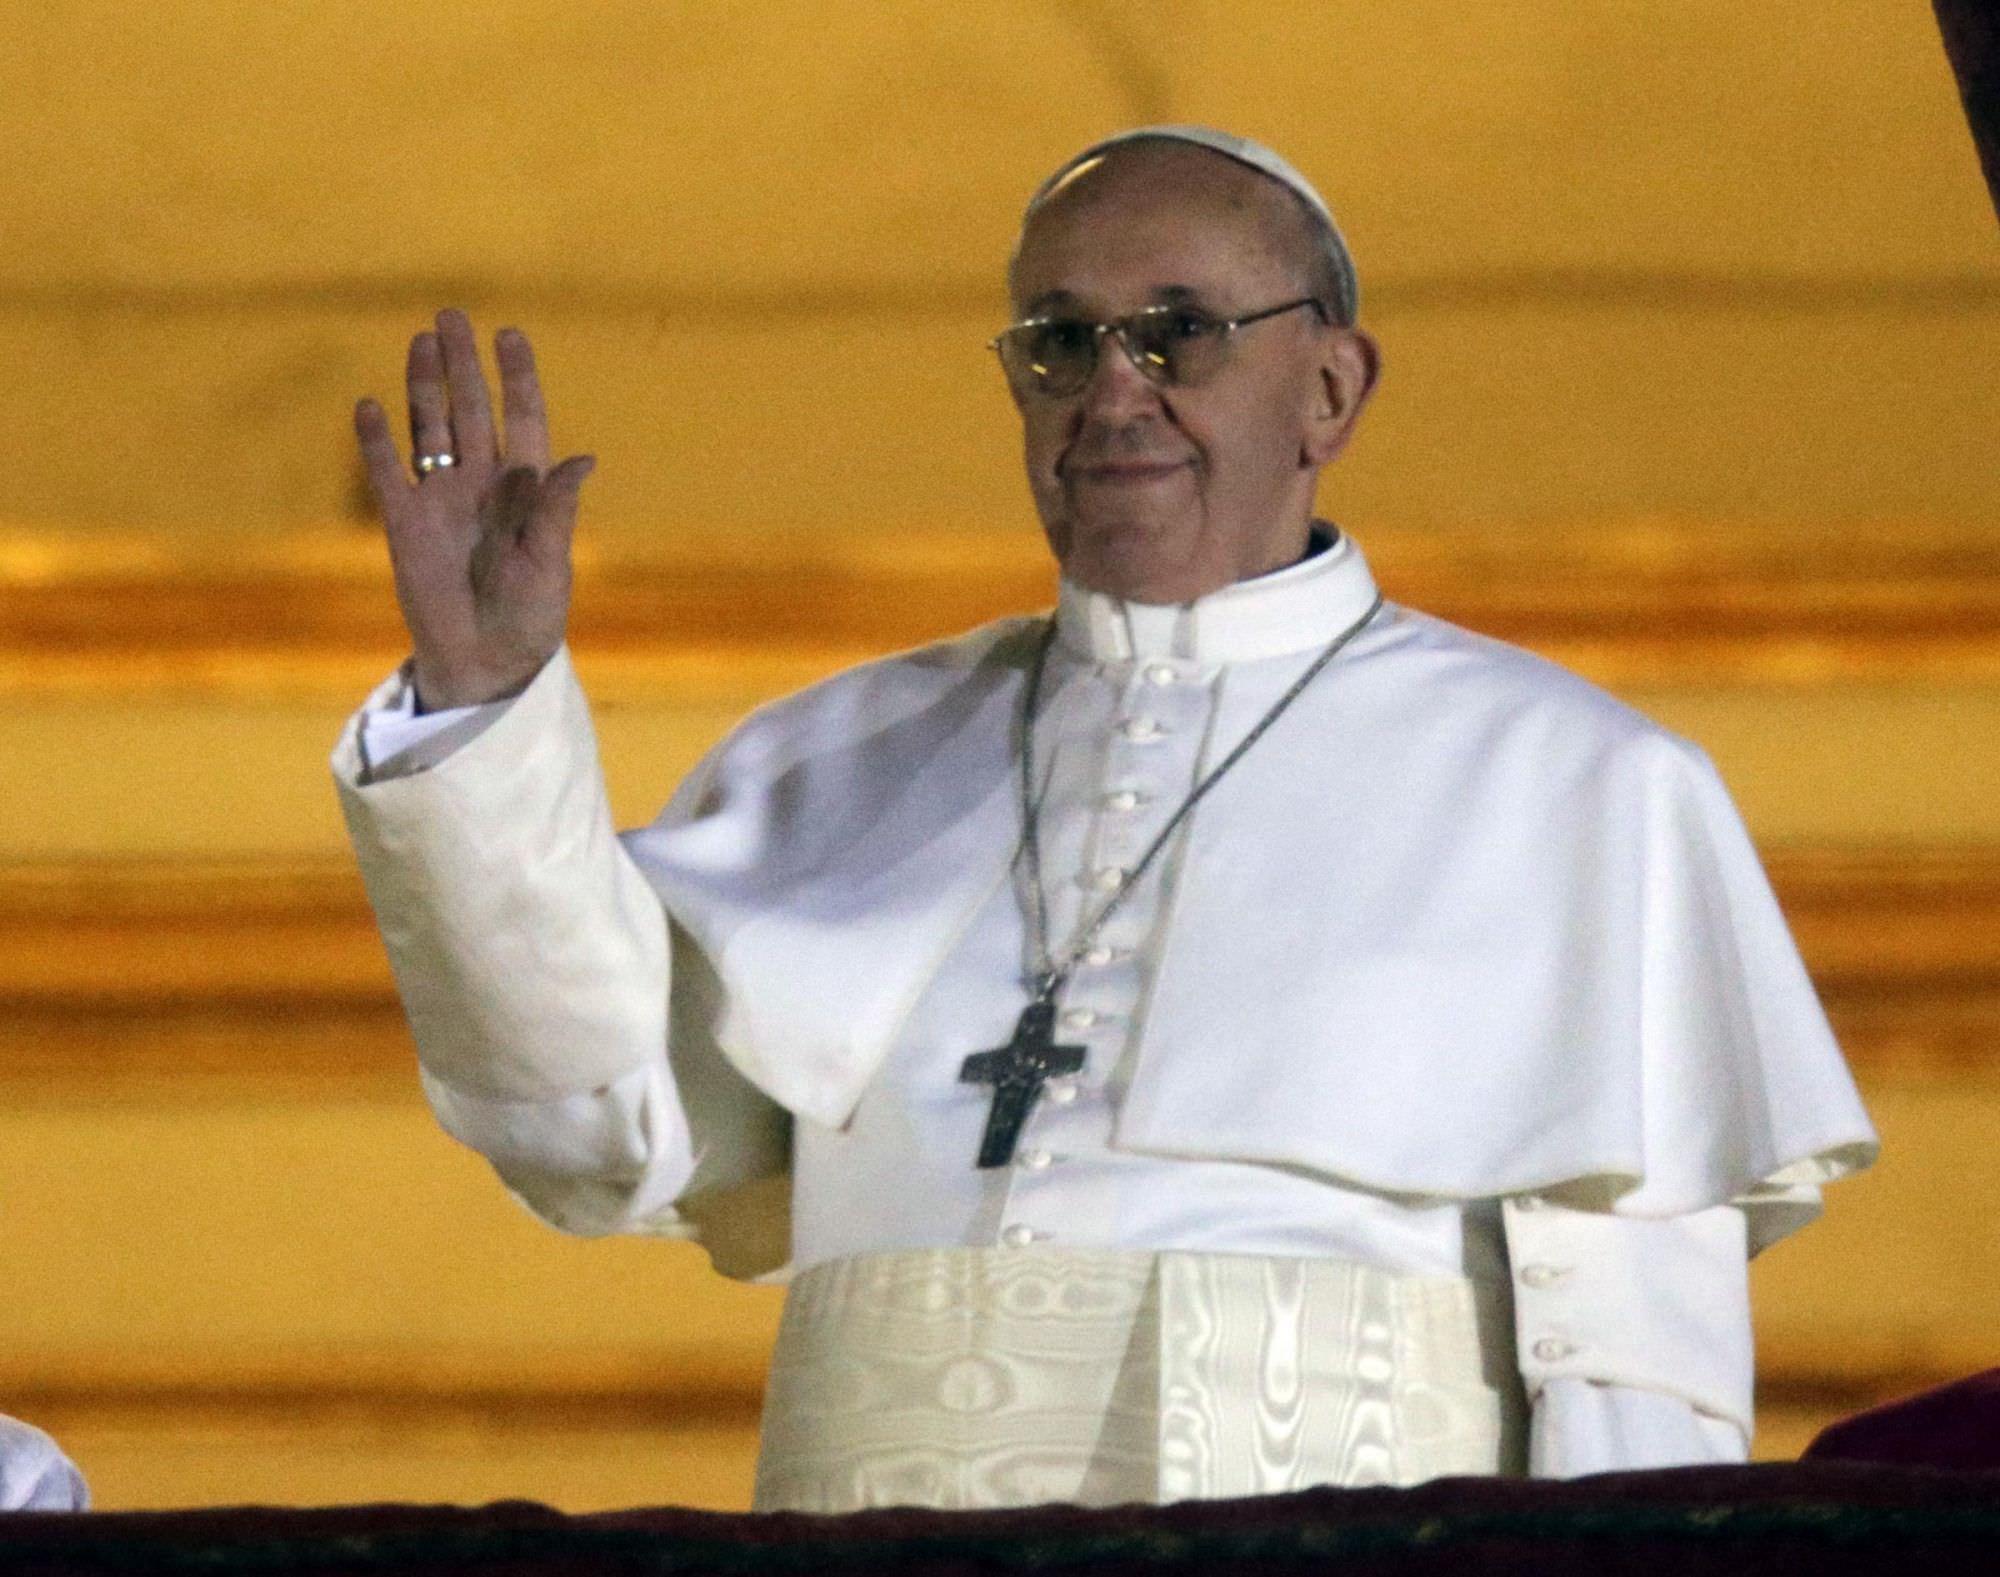 Ernesto Simoni nominato Cardinale da papa Francesco celebra messa a Viareggio